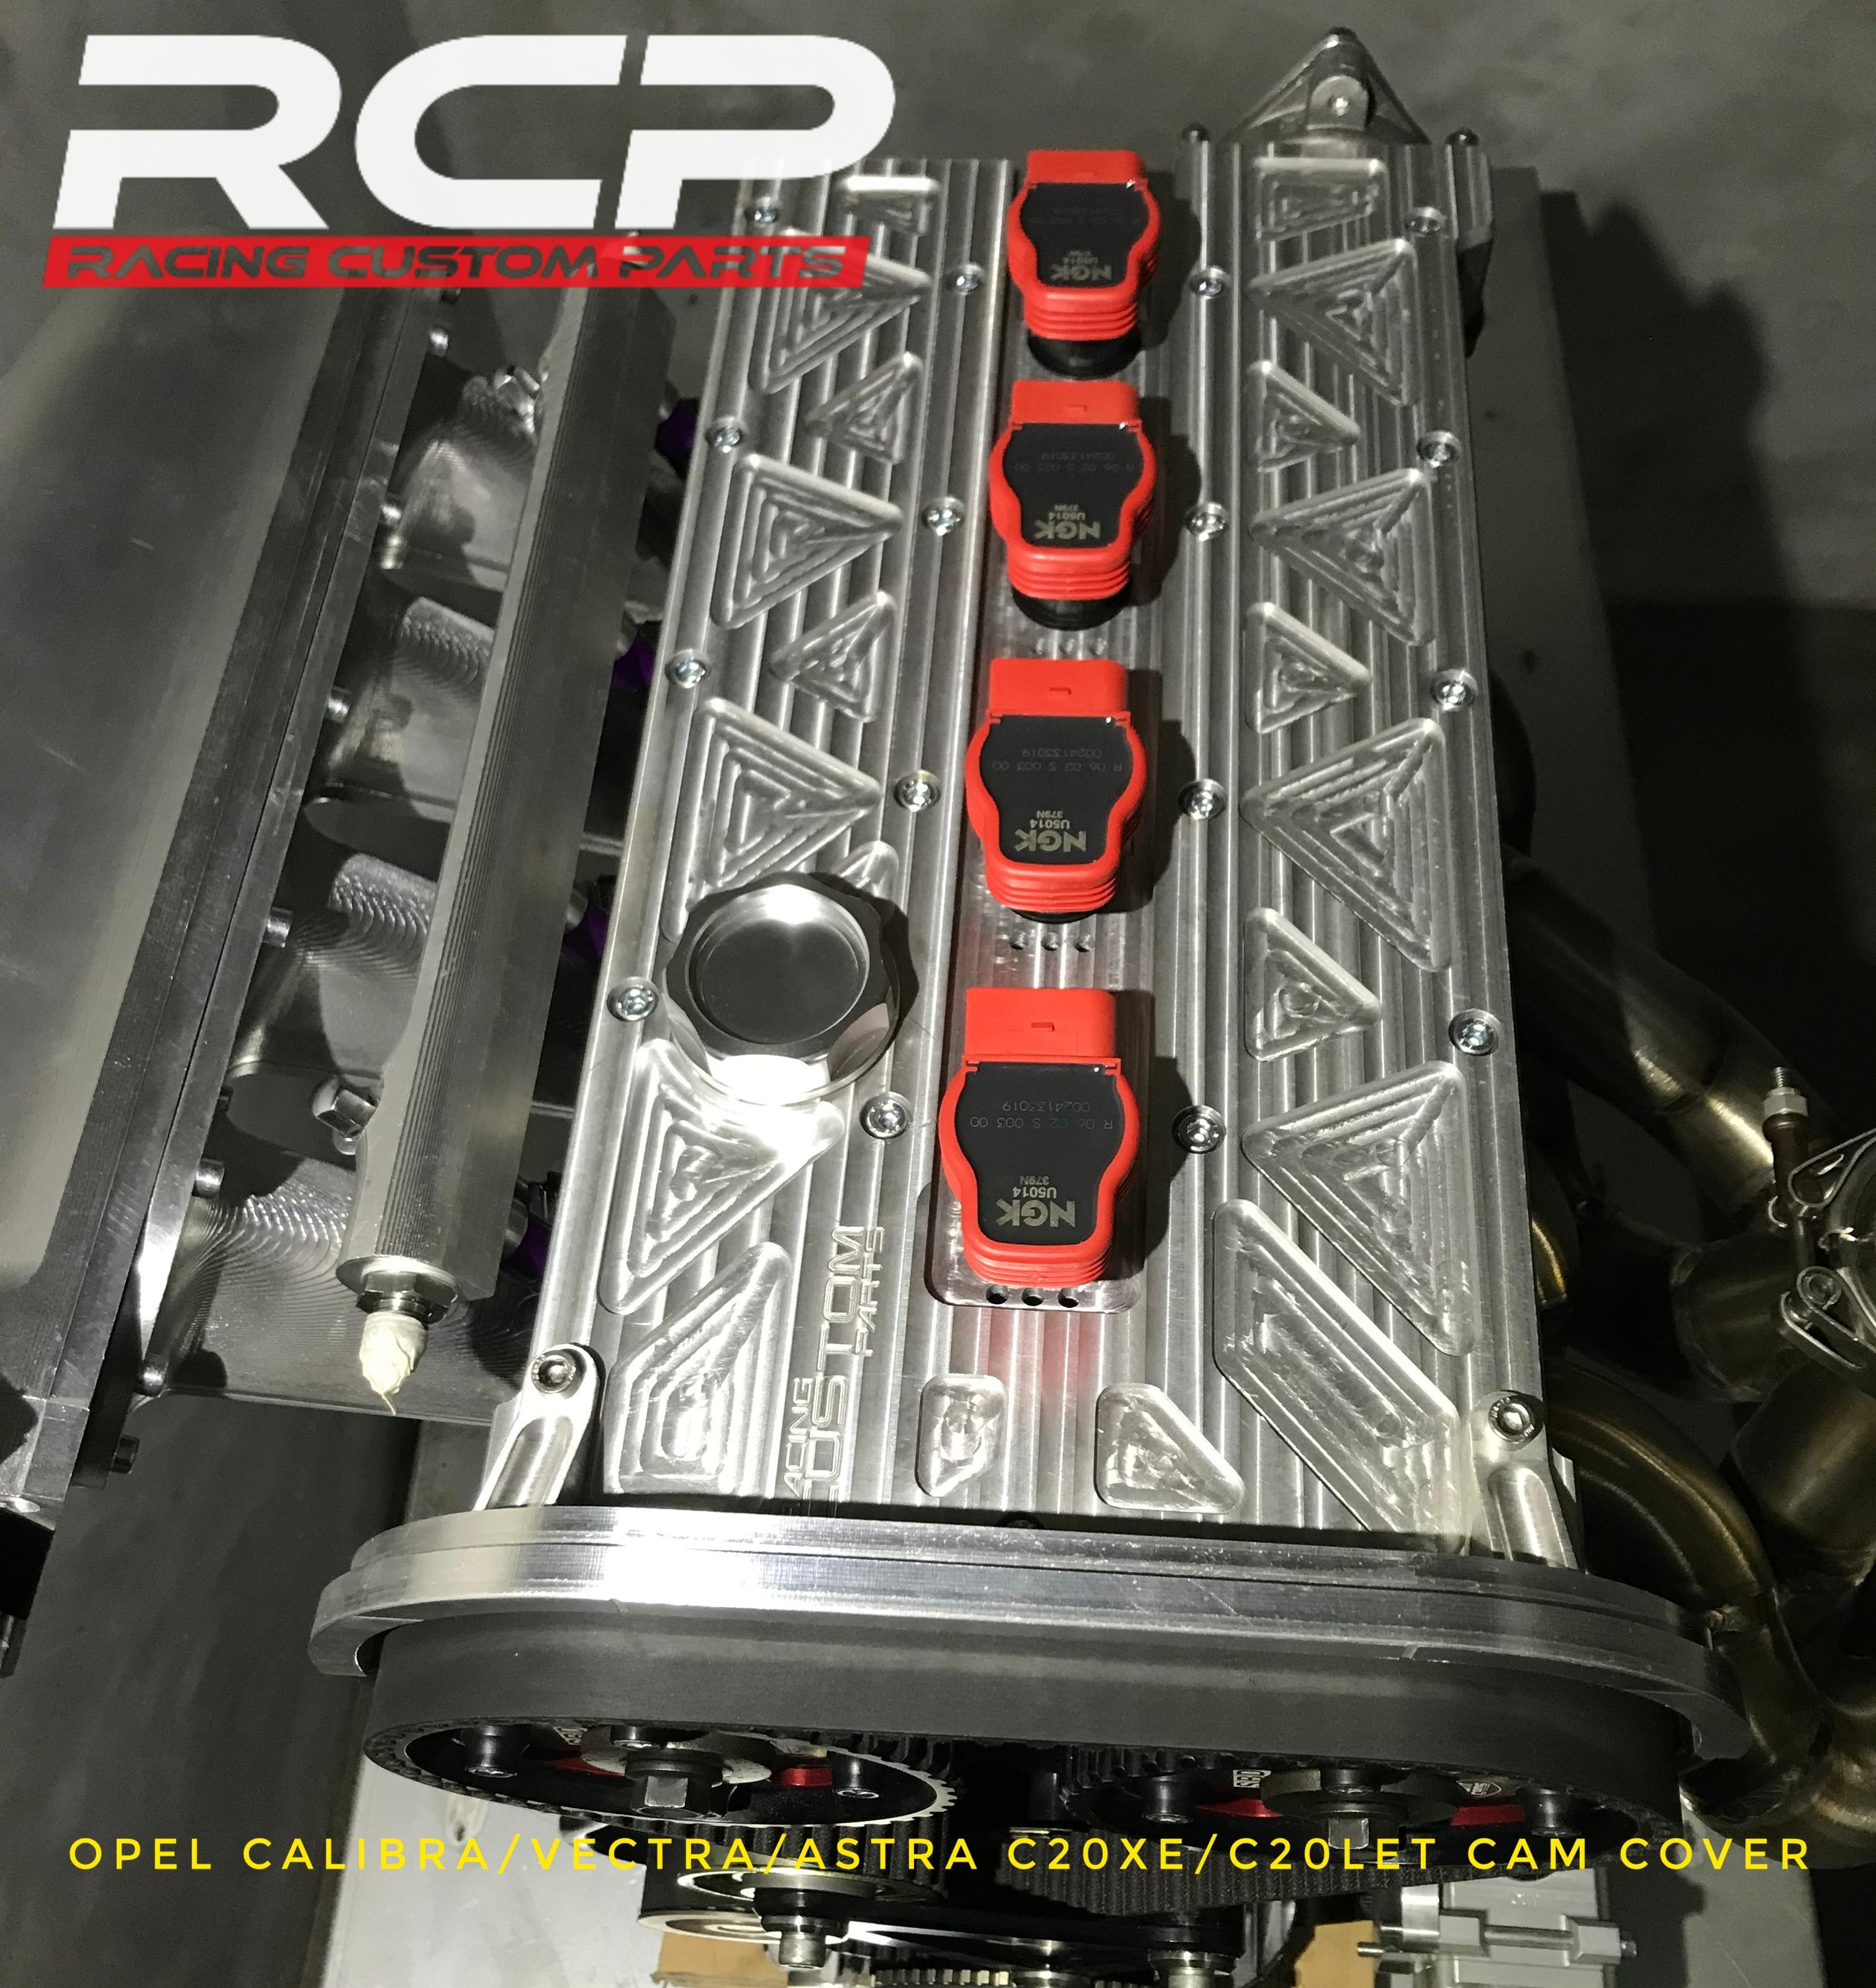 opel calibra vectra astra c20xe c20let turbo billet cnc cam cover head cover rcp racing custom parts